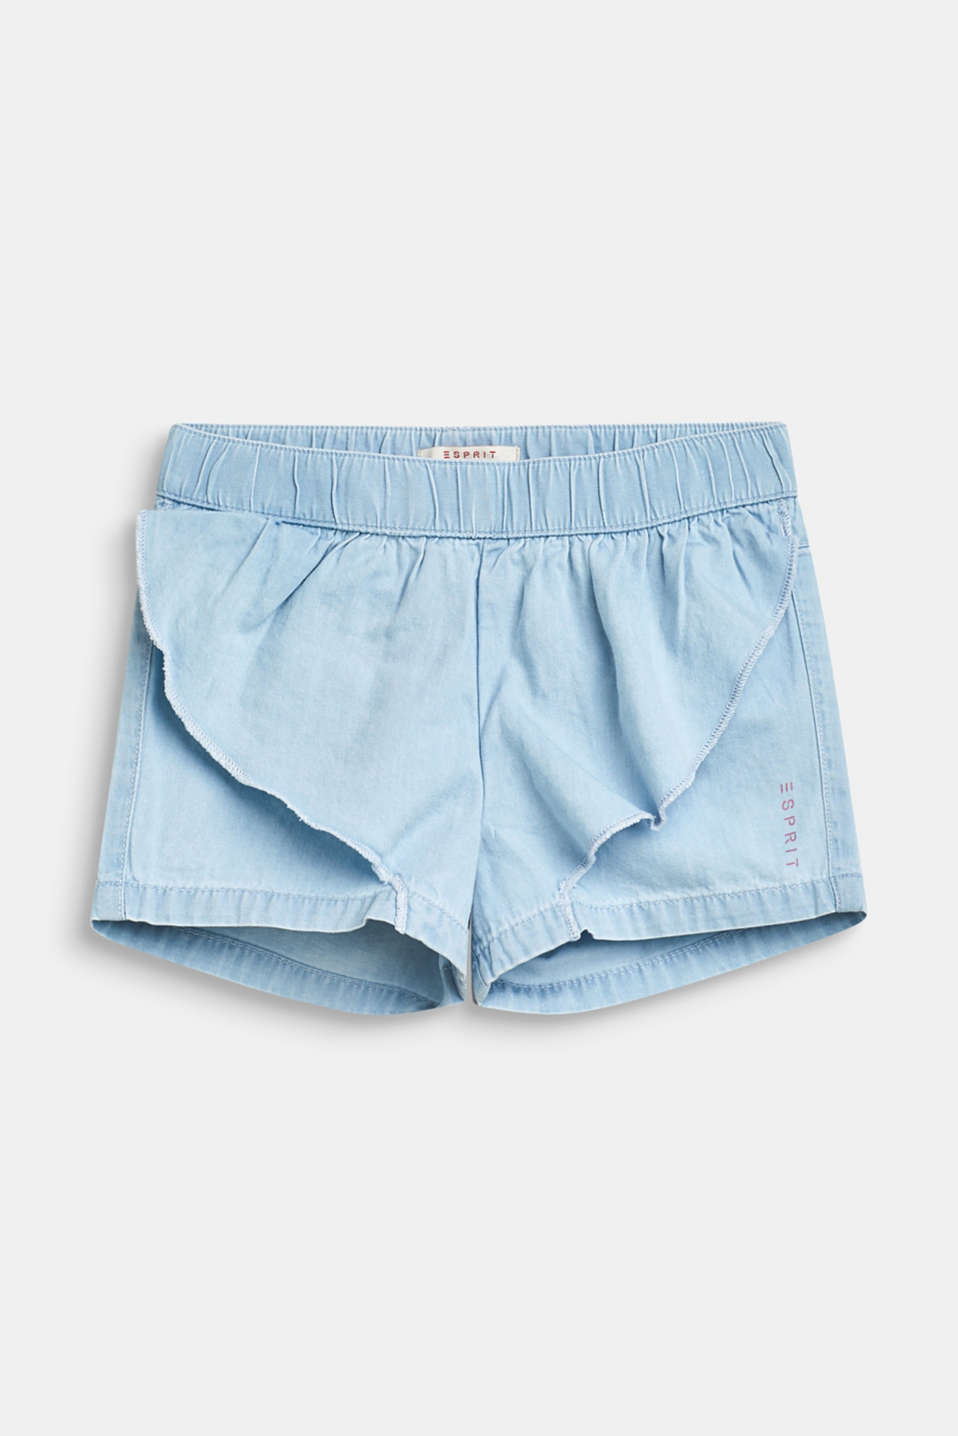 Esprit Frill detail denim shorts, 100% cotton at our